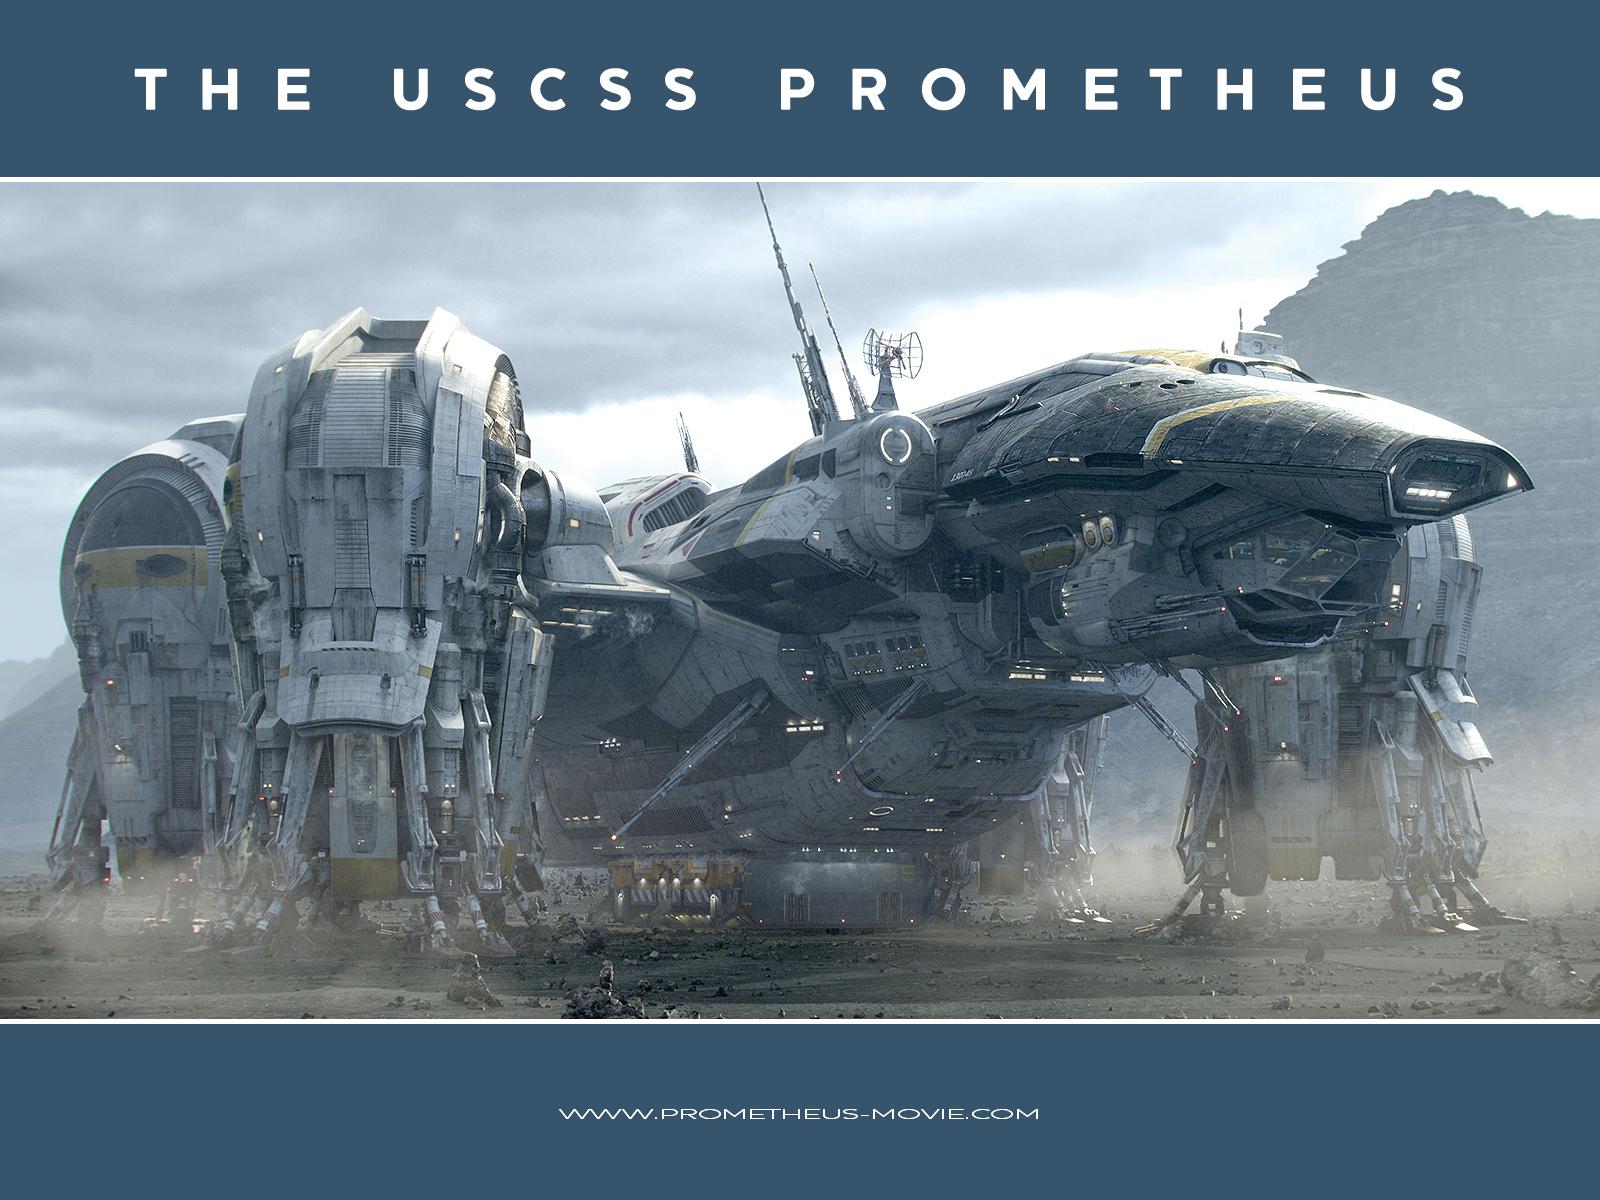 http://3.bp.blogspot.com/-YzzLGcIqcPQ/T8y_zBdYS0I/AAAAAAAABvw/o1lyM2j6JbE/s1600/Prometheus+Ship+1600+x+1200+01.jpg